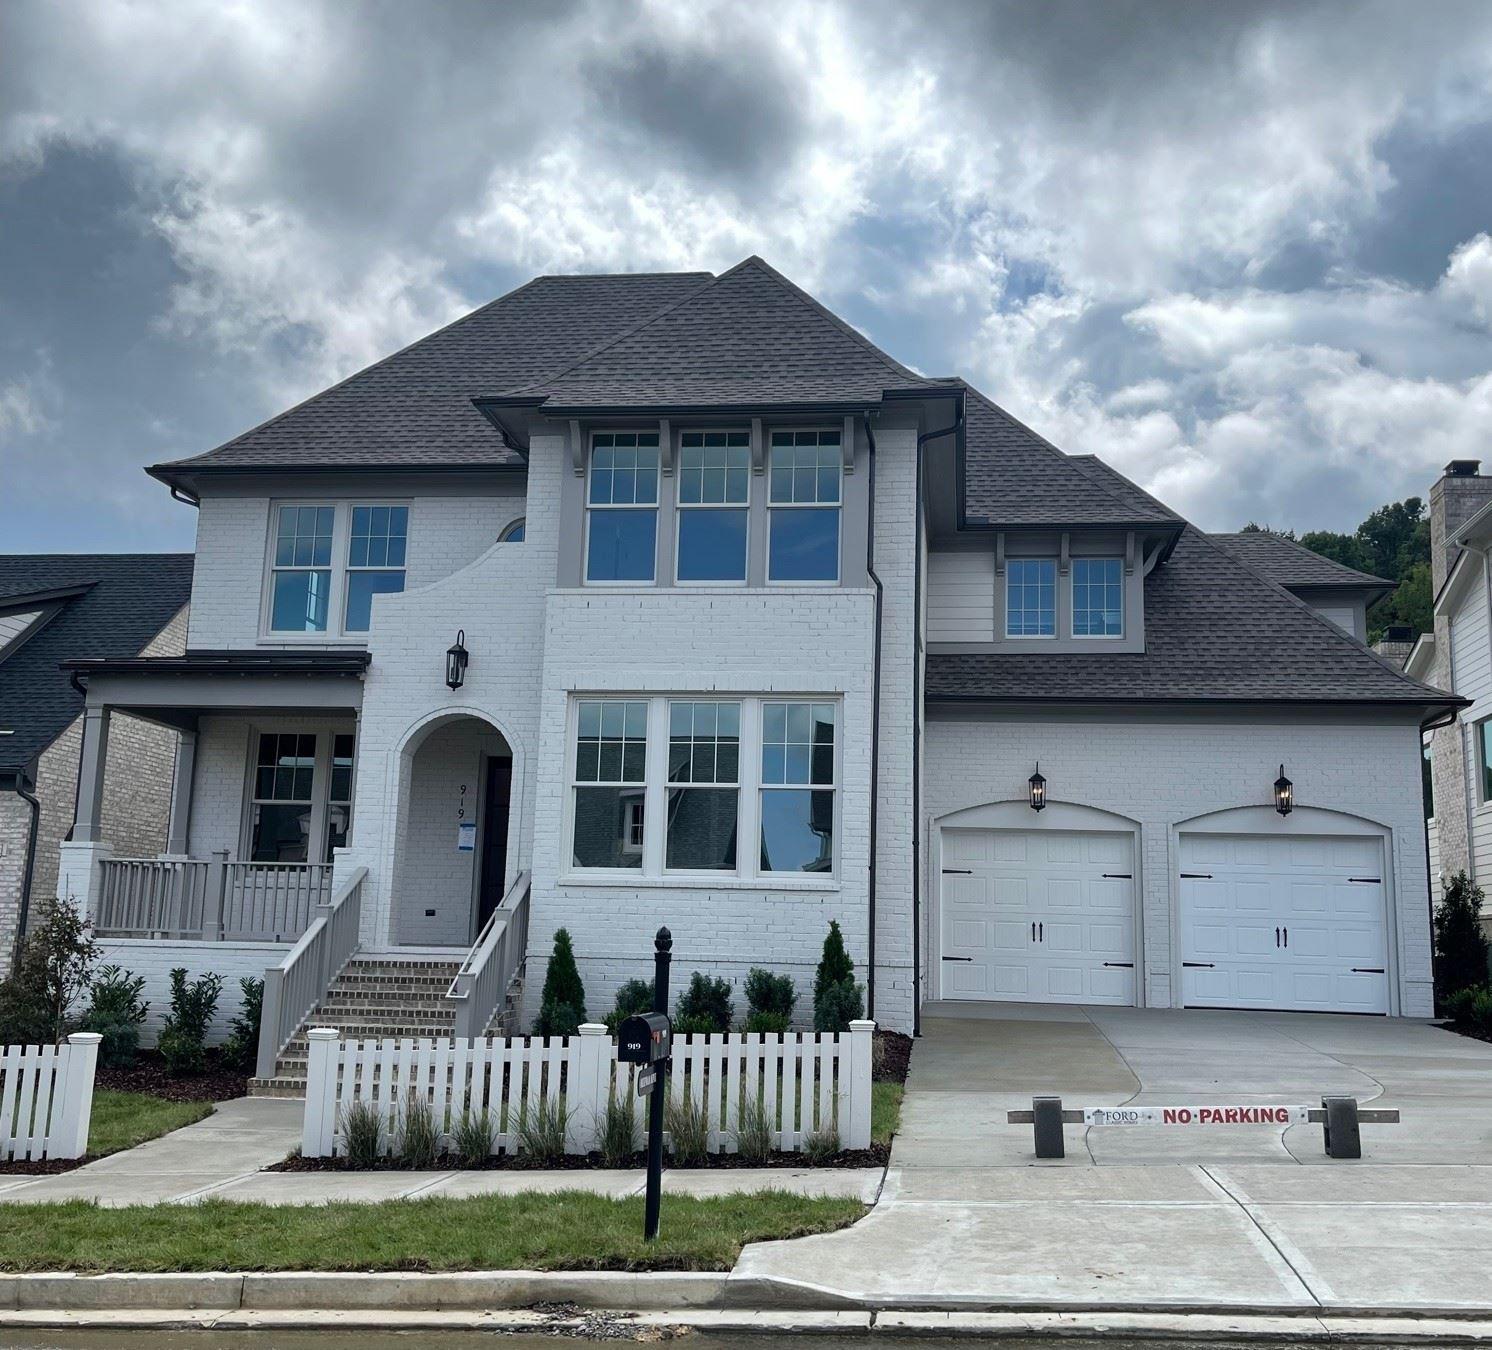 919 Cheltenham Ave, Lot # 2141, Franklin, TN 37064 - MLS#: 2249954